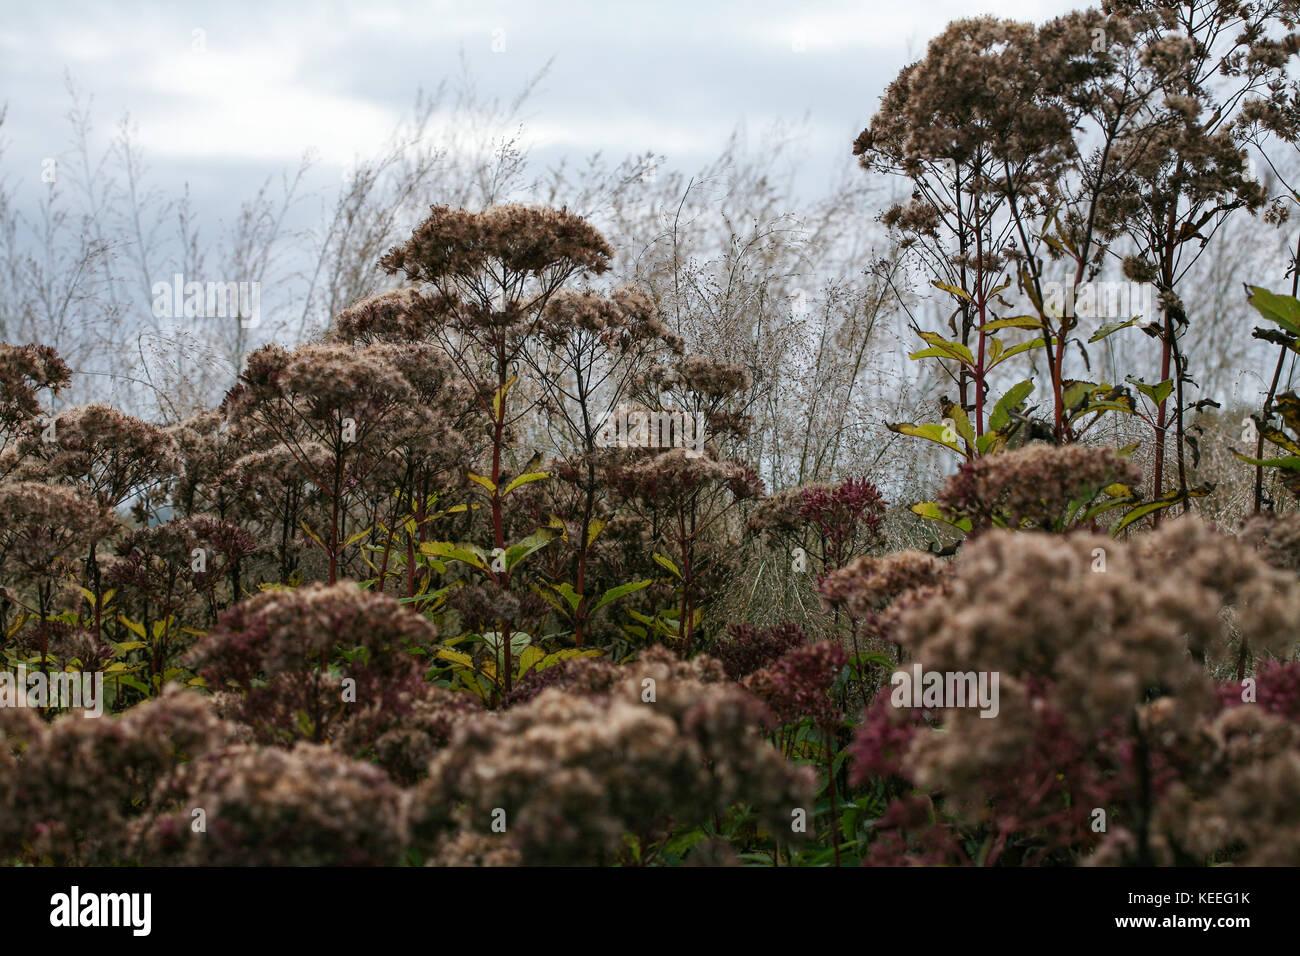 Eupatorium purpureum in autumn, flowers fading colour and foliage taking on autumnal tones - Stock Image